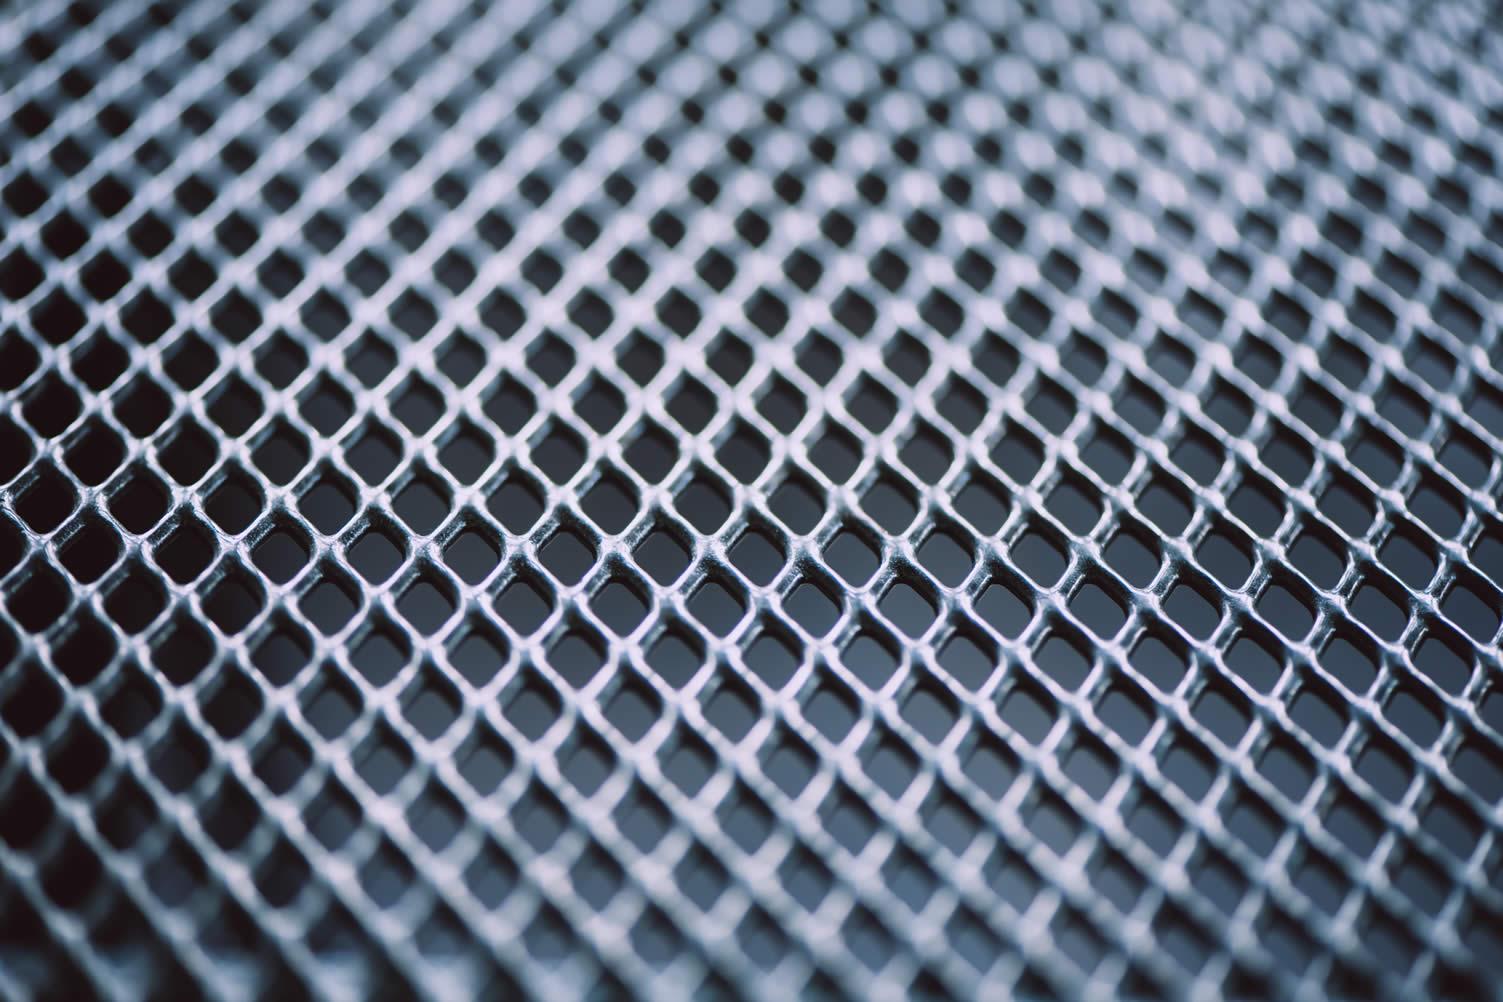 what types of lattice screening